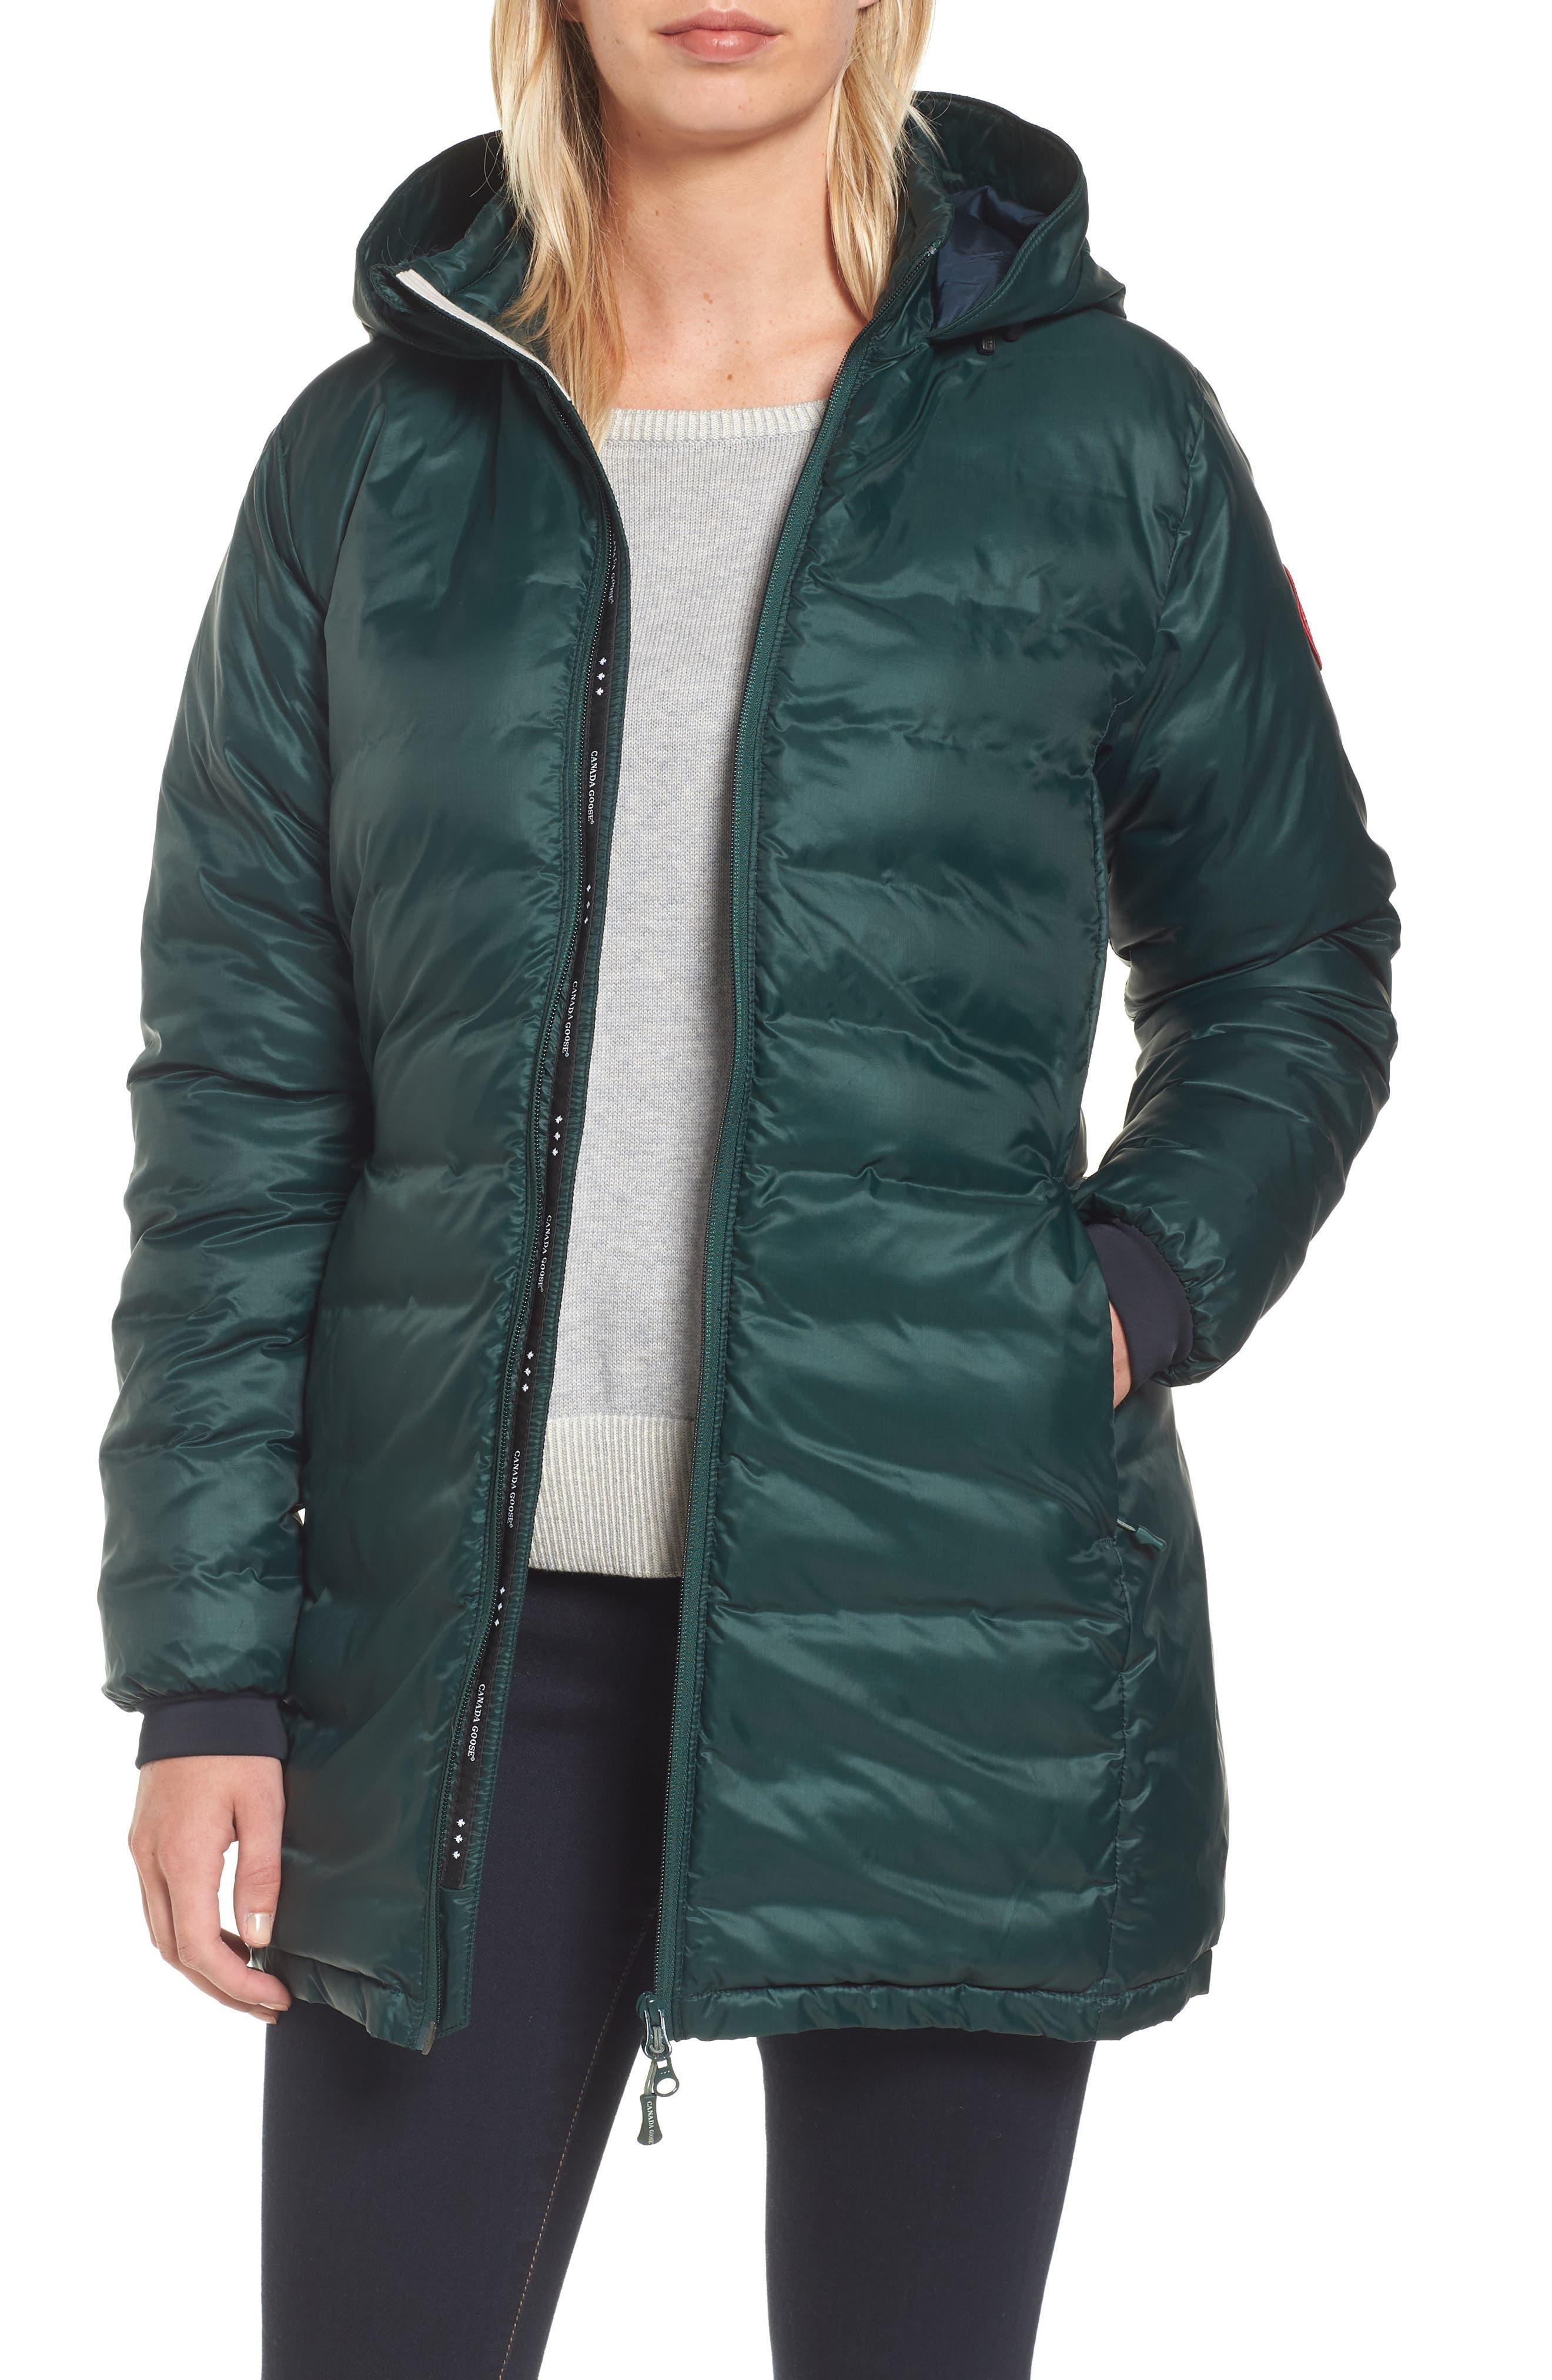 Alternate Image 1 Selected - Canada Goose 'Camp' Slim Fit Hooded Packable Down Jacket